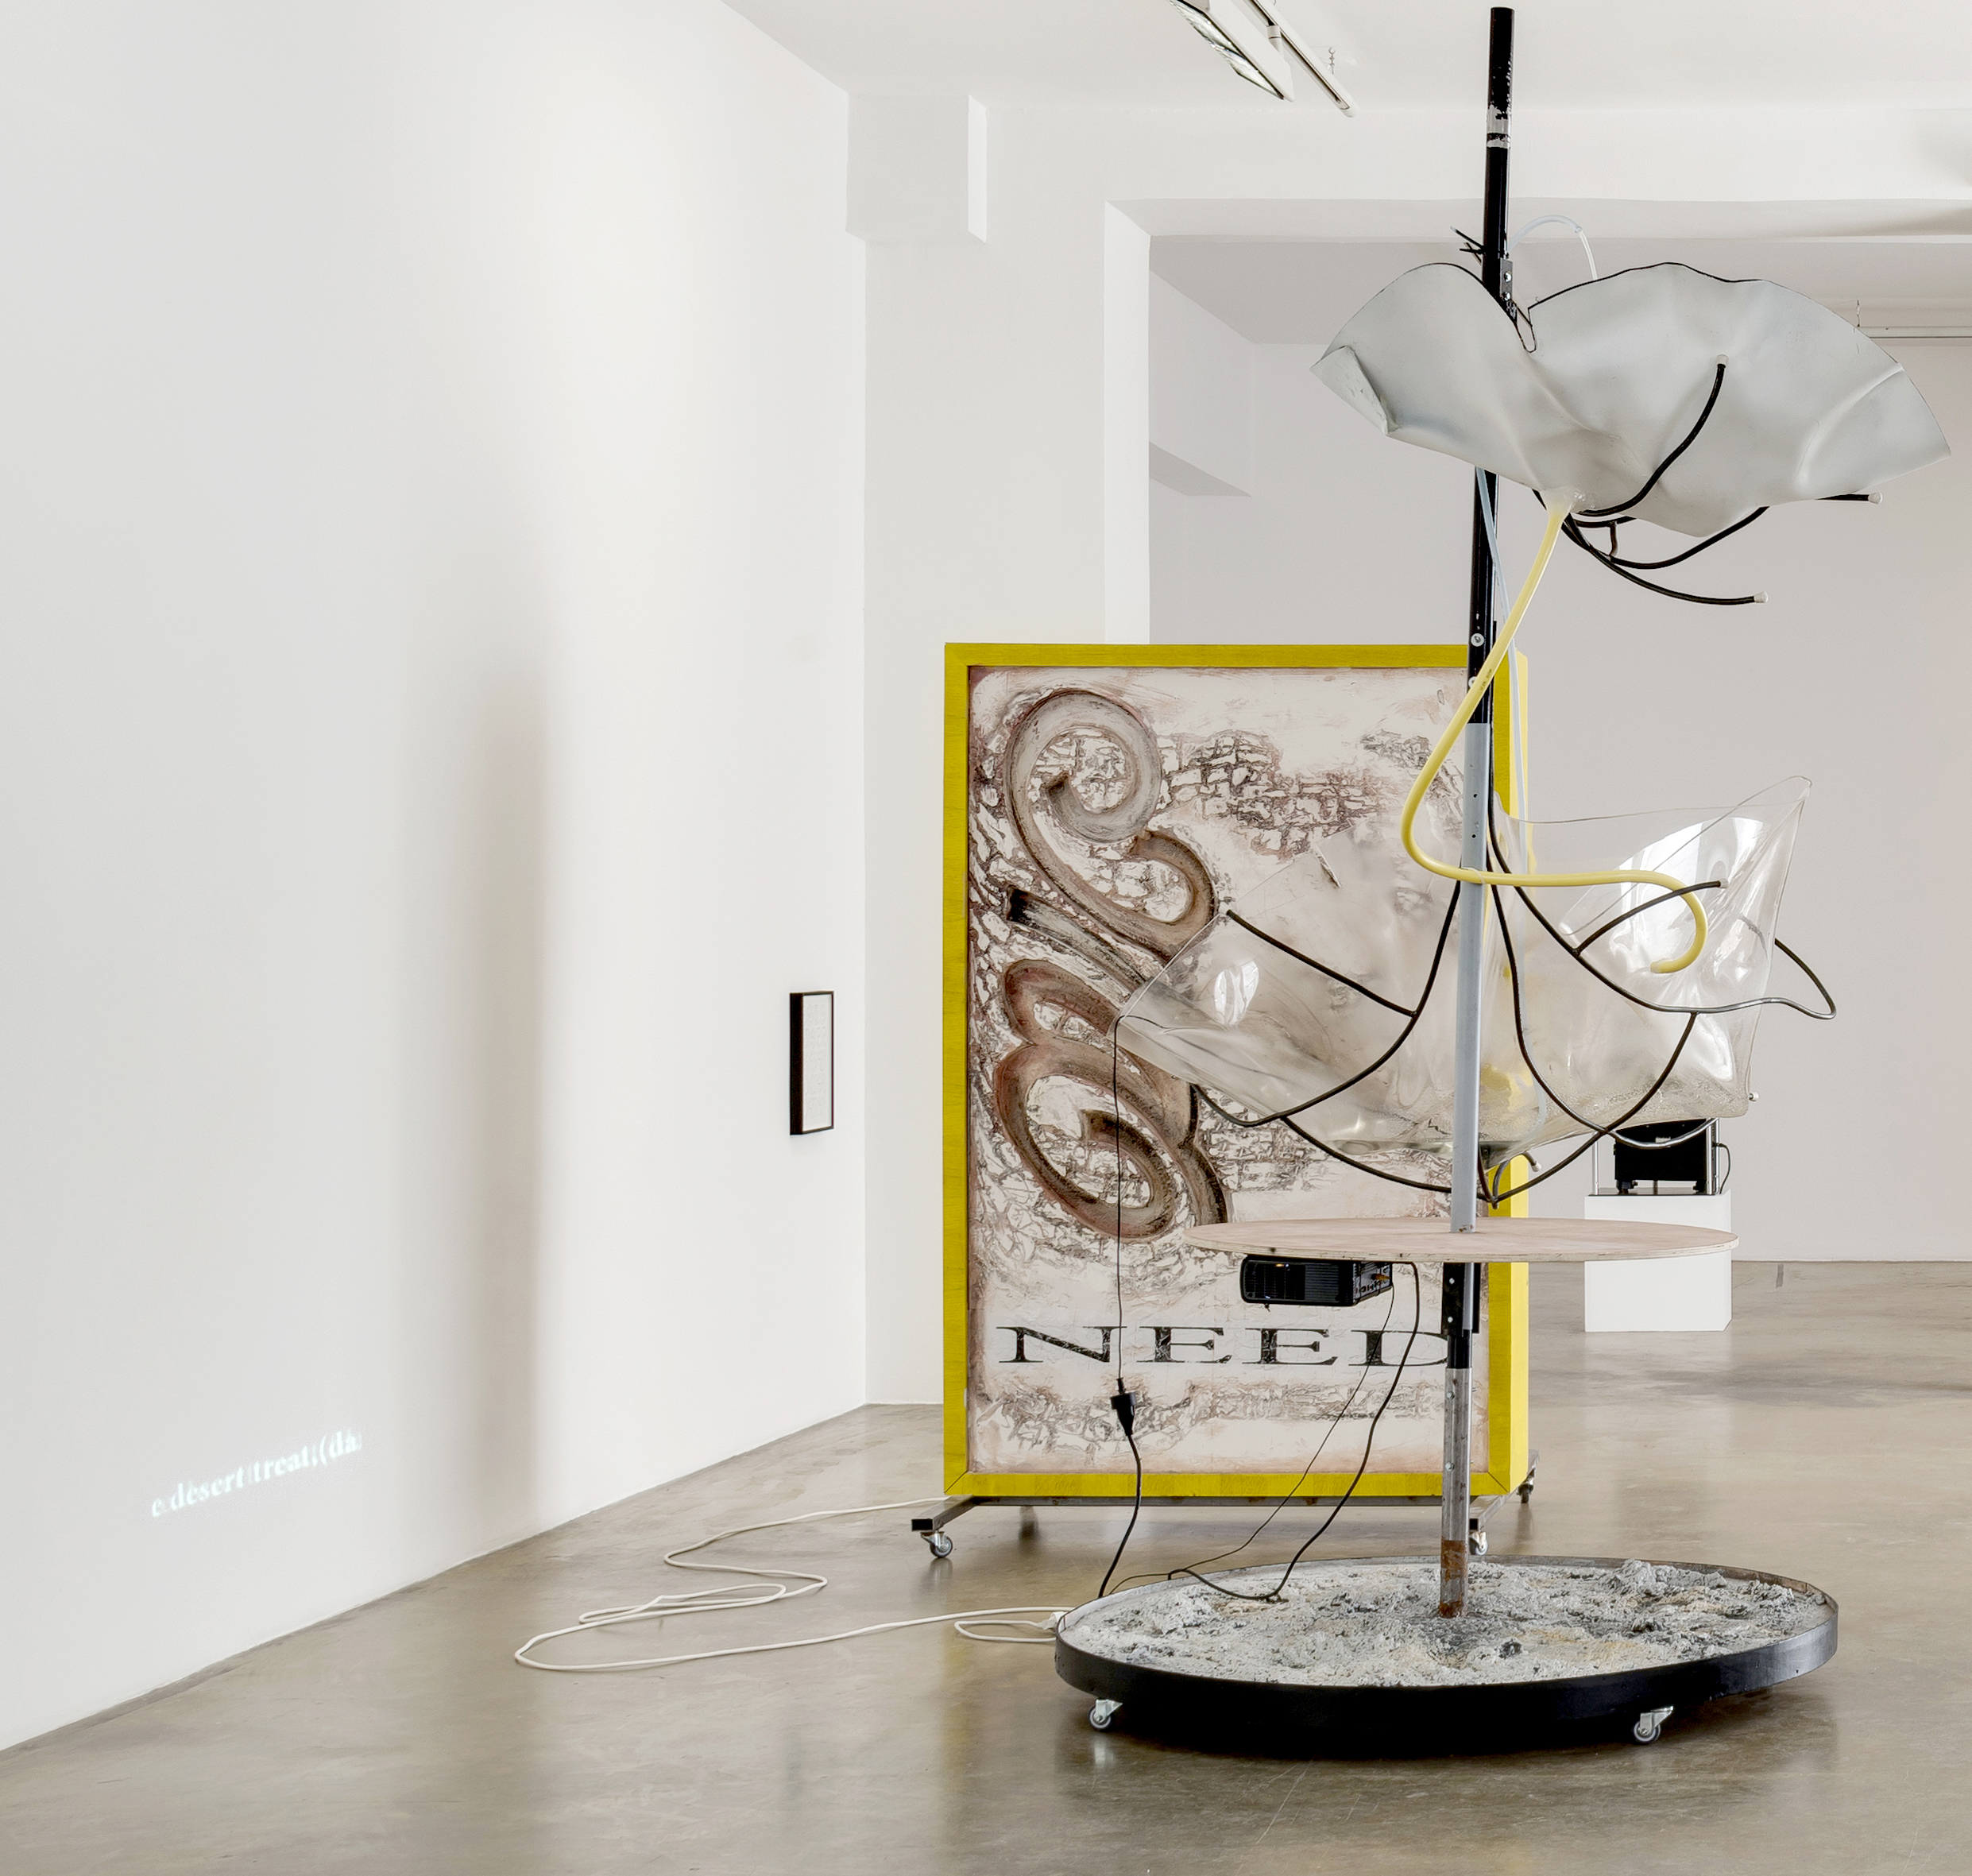 Kunsthalle Fridericianum Opens Danh Vo Exhibition : Museum